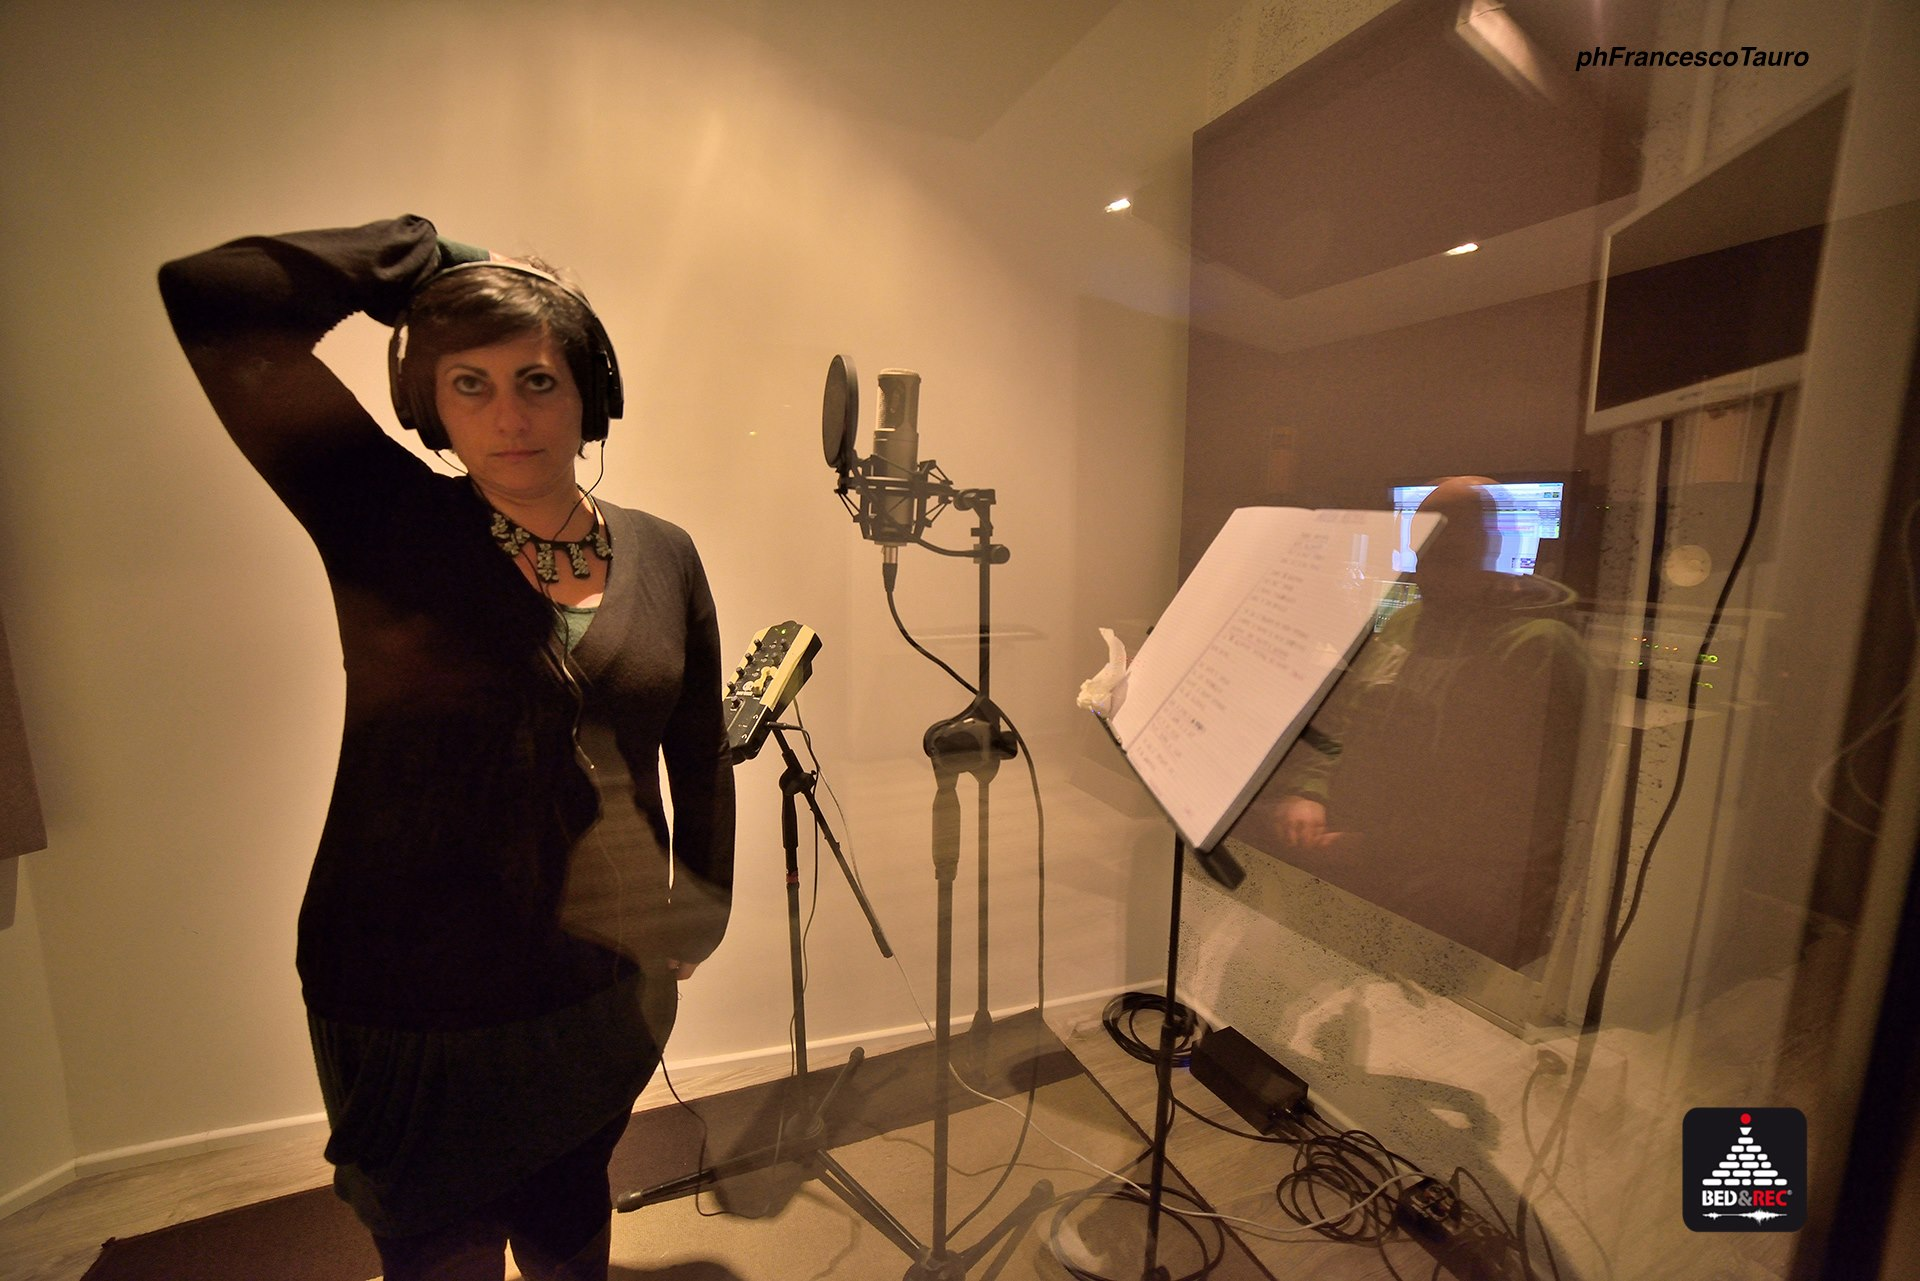 Suonitineranti - Studio Session - Bed&Rec - Officina Musicale